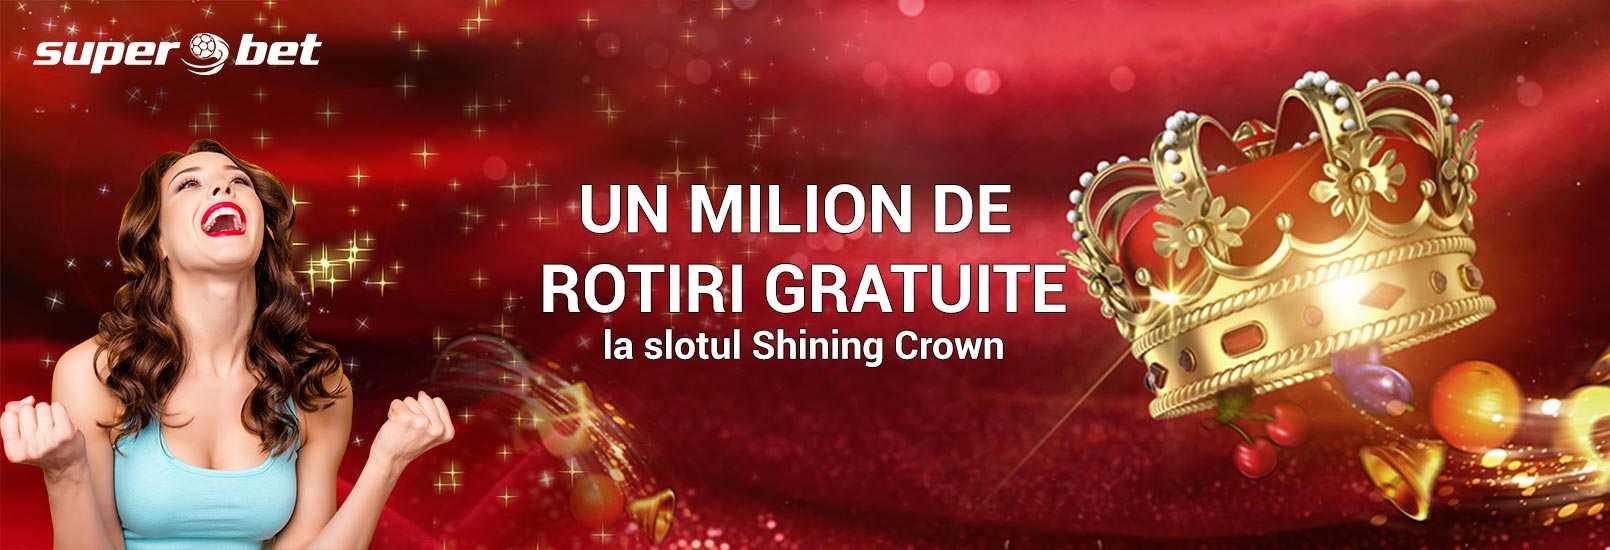 oferta cu un milion de rotiri gratuite shining crown